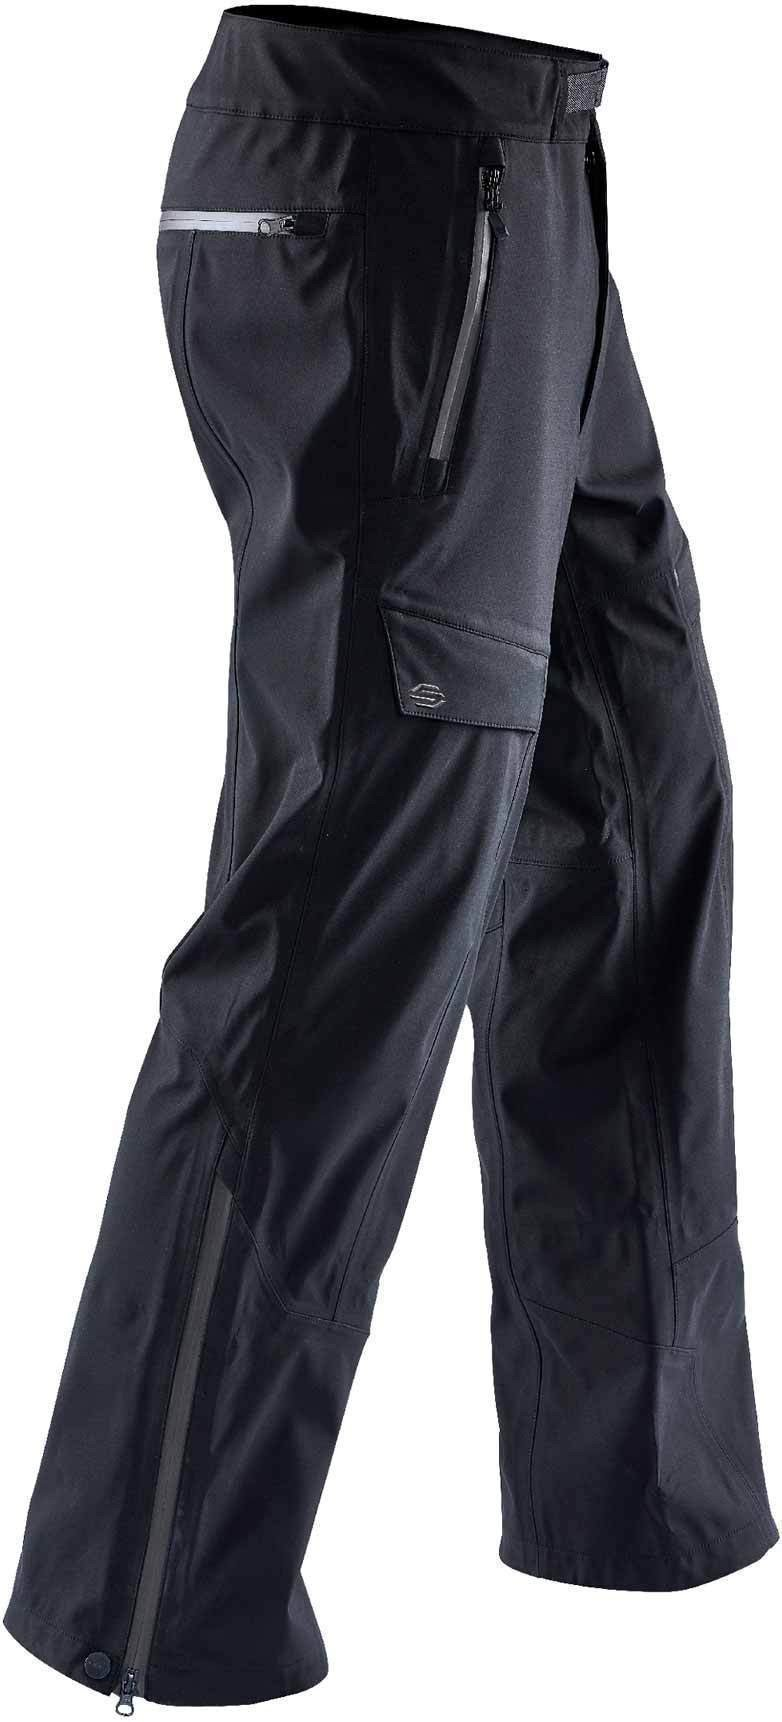 WTSTRXP-1 - Black - WorkwearToronto.com - Men's Synthesis Pants With Optional Custom Logo - Custom Clothing in GTA